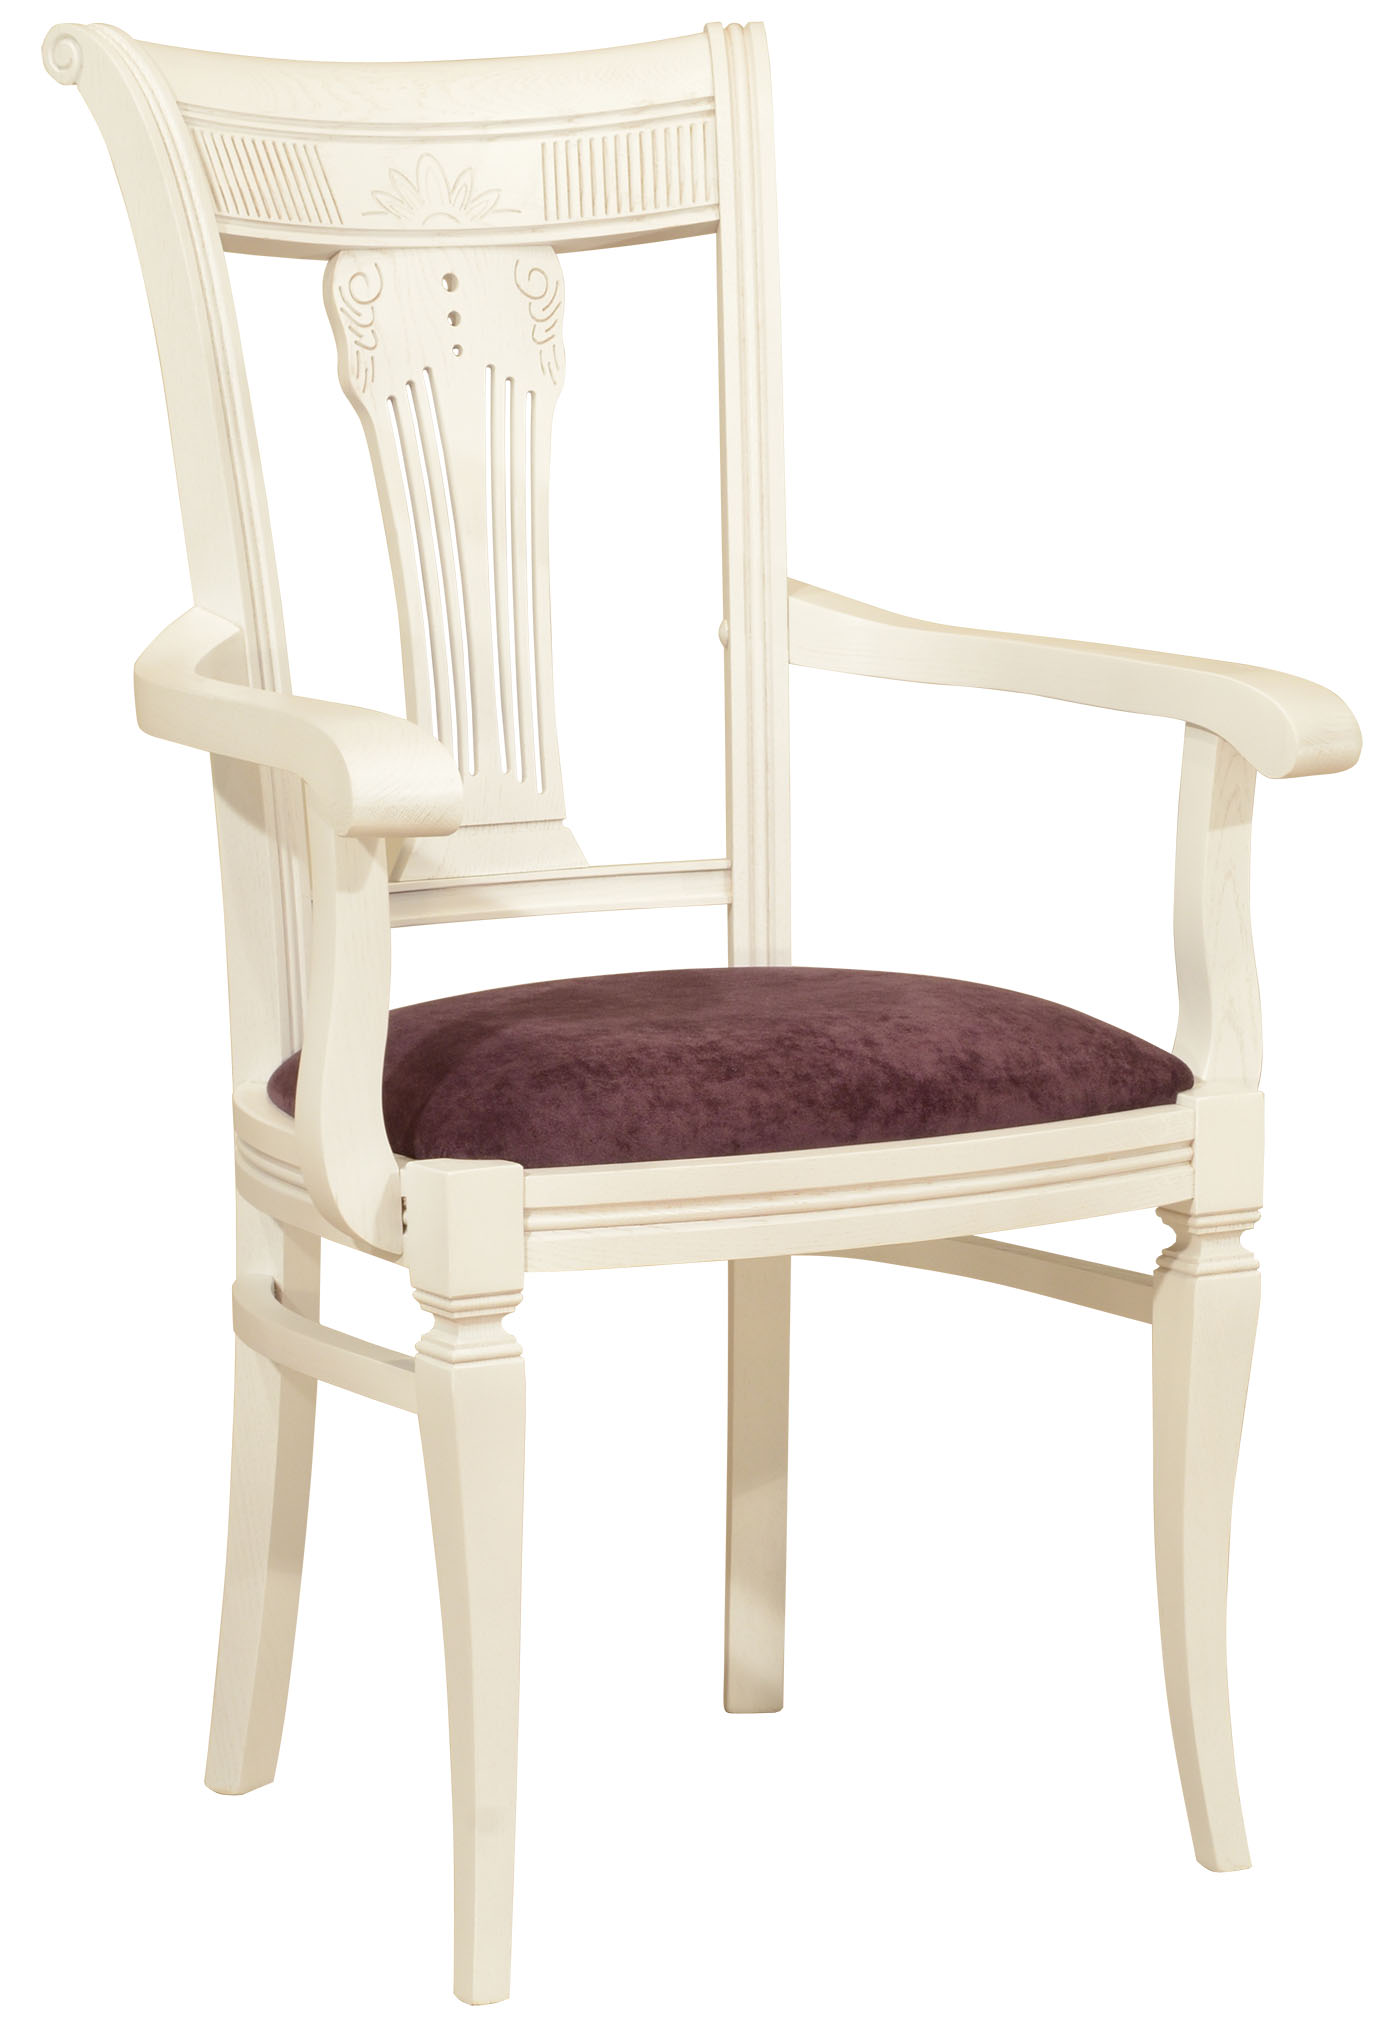 стул (Кресло) Сенатор-2